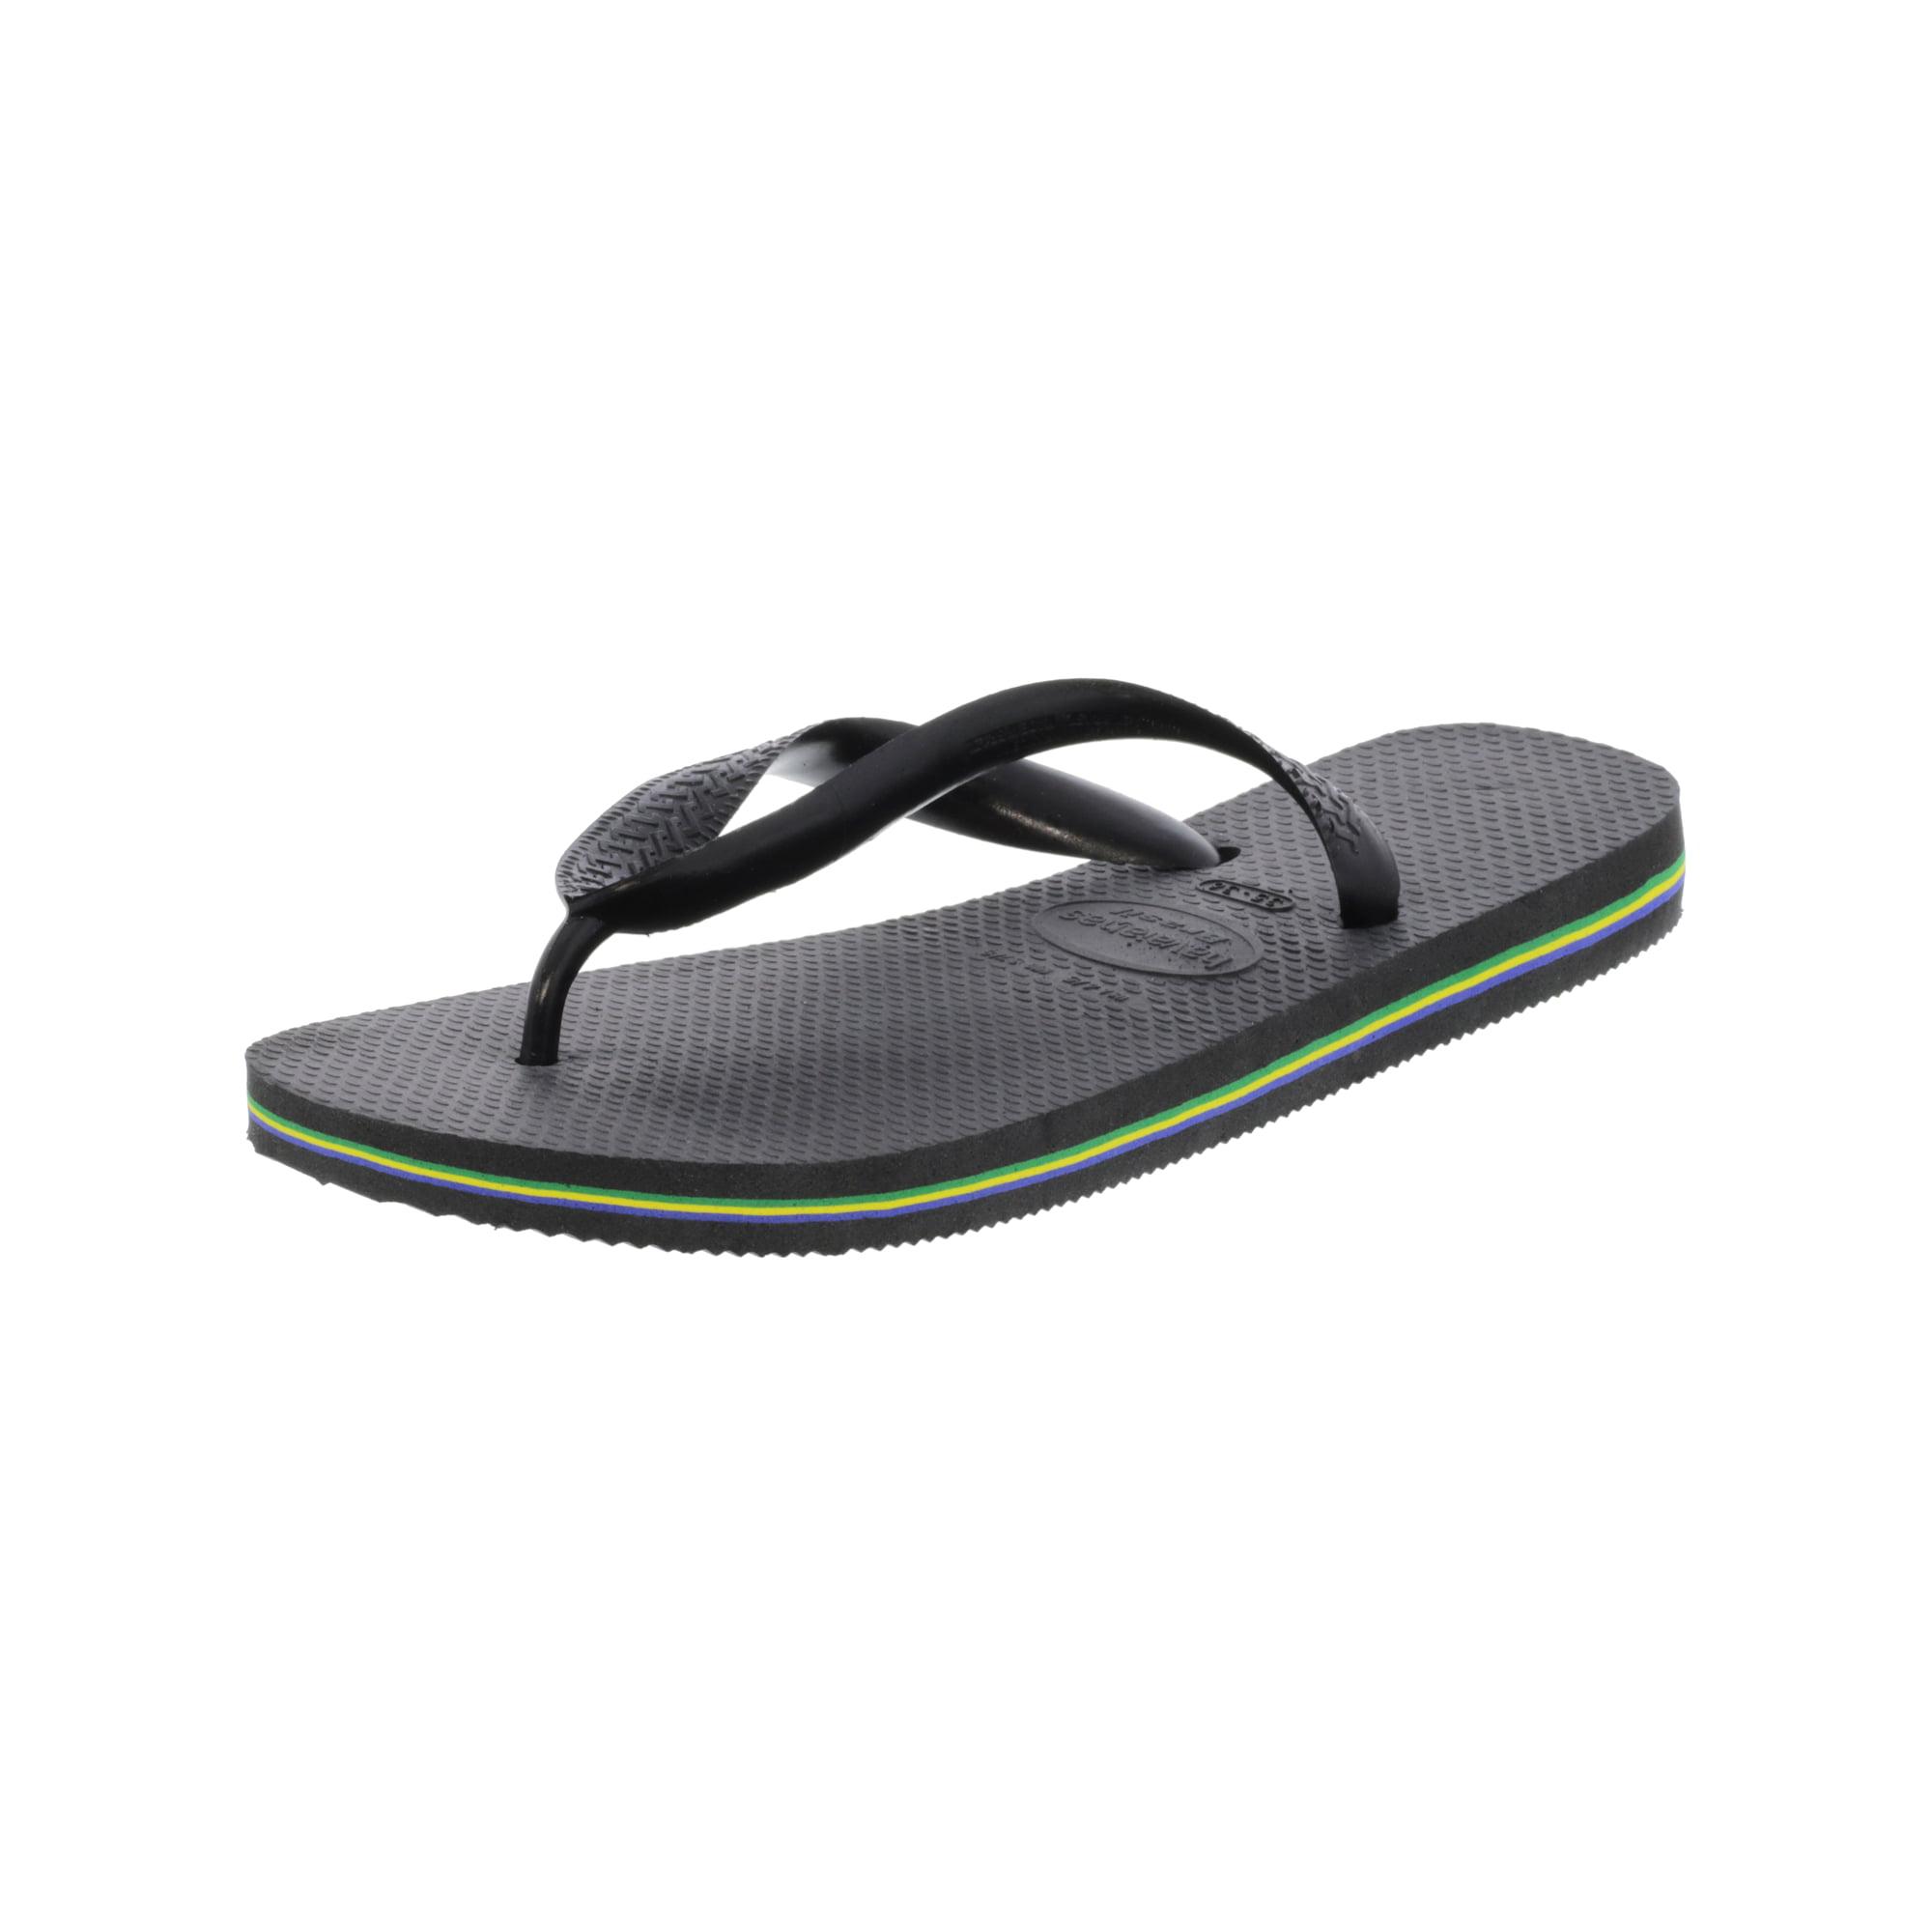 b1792edc1e83 Havaianas Women s Brazil Black Rubber Sandal - 5M